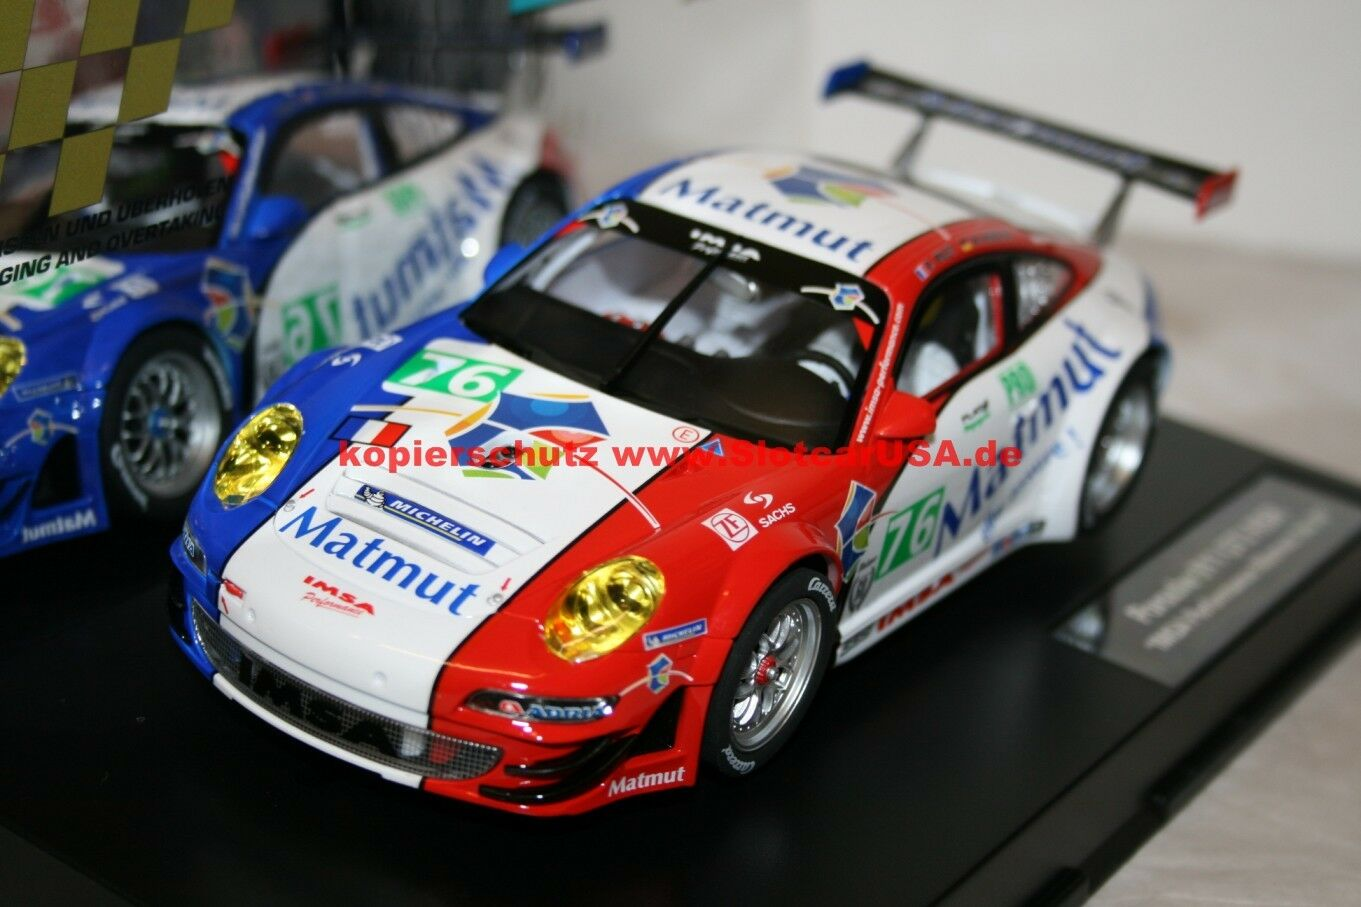 autorera Digital 124 23863 Porsche 911 GT3 Rsr  Imsa Perforuomoce Matmut, N° 76  vendite online